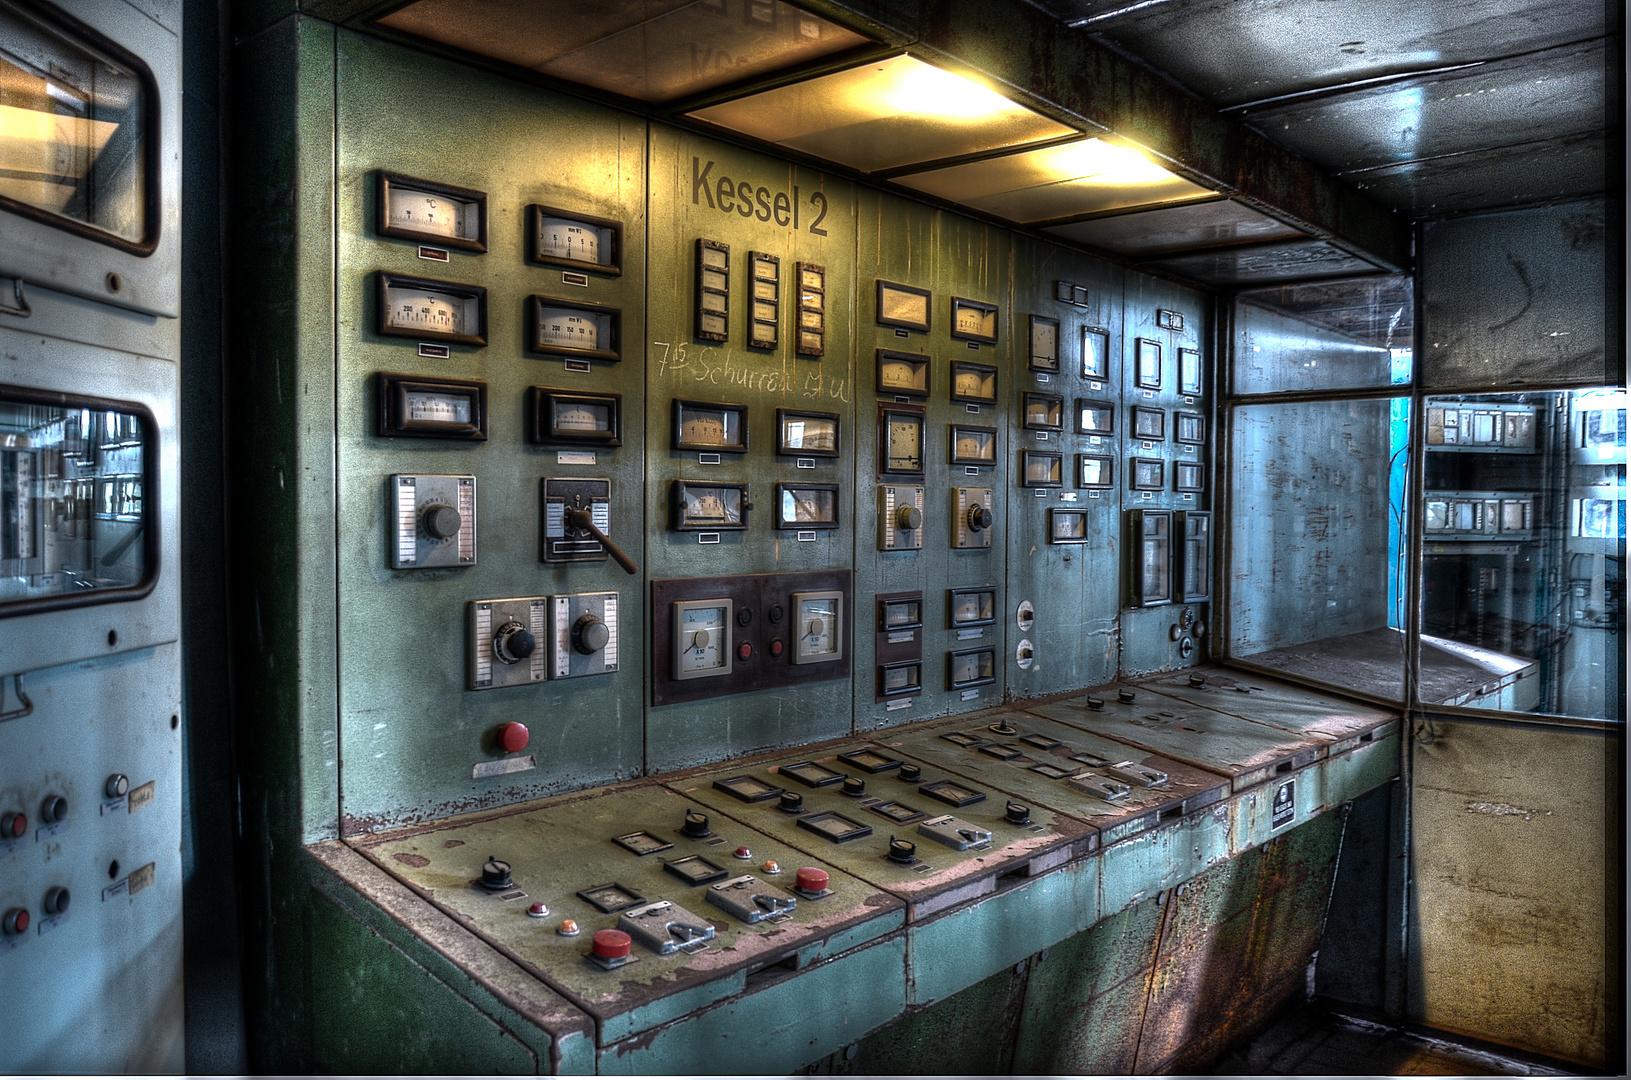 Kessel 2 Kraftwerk Peenemünde Foto & Bild | bearbeitungs - techniken ...